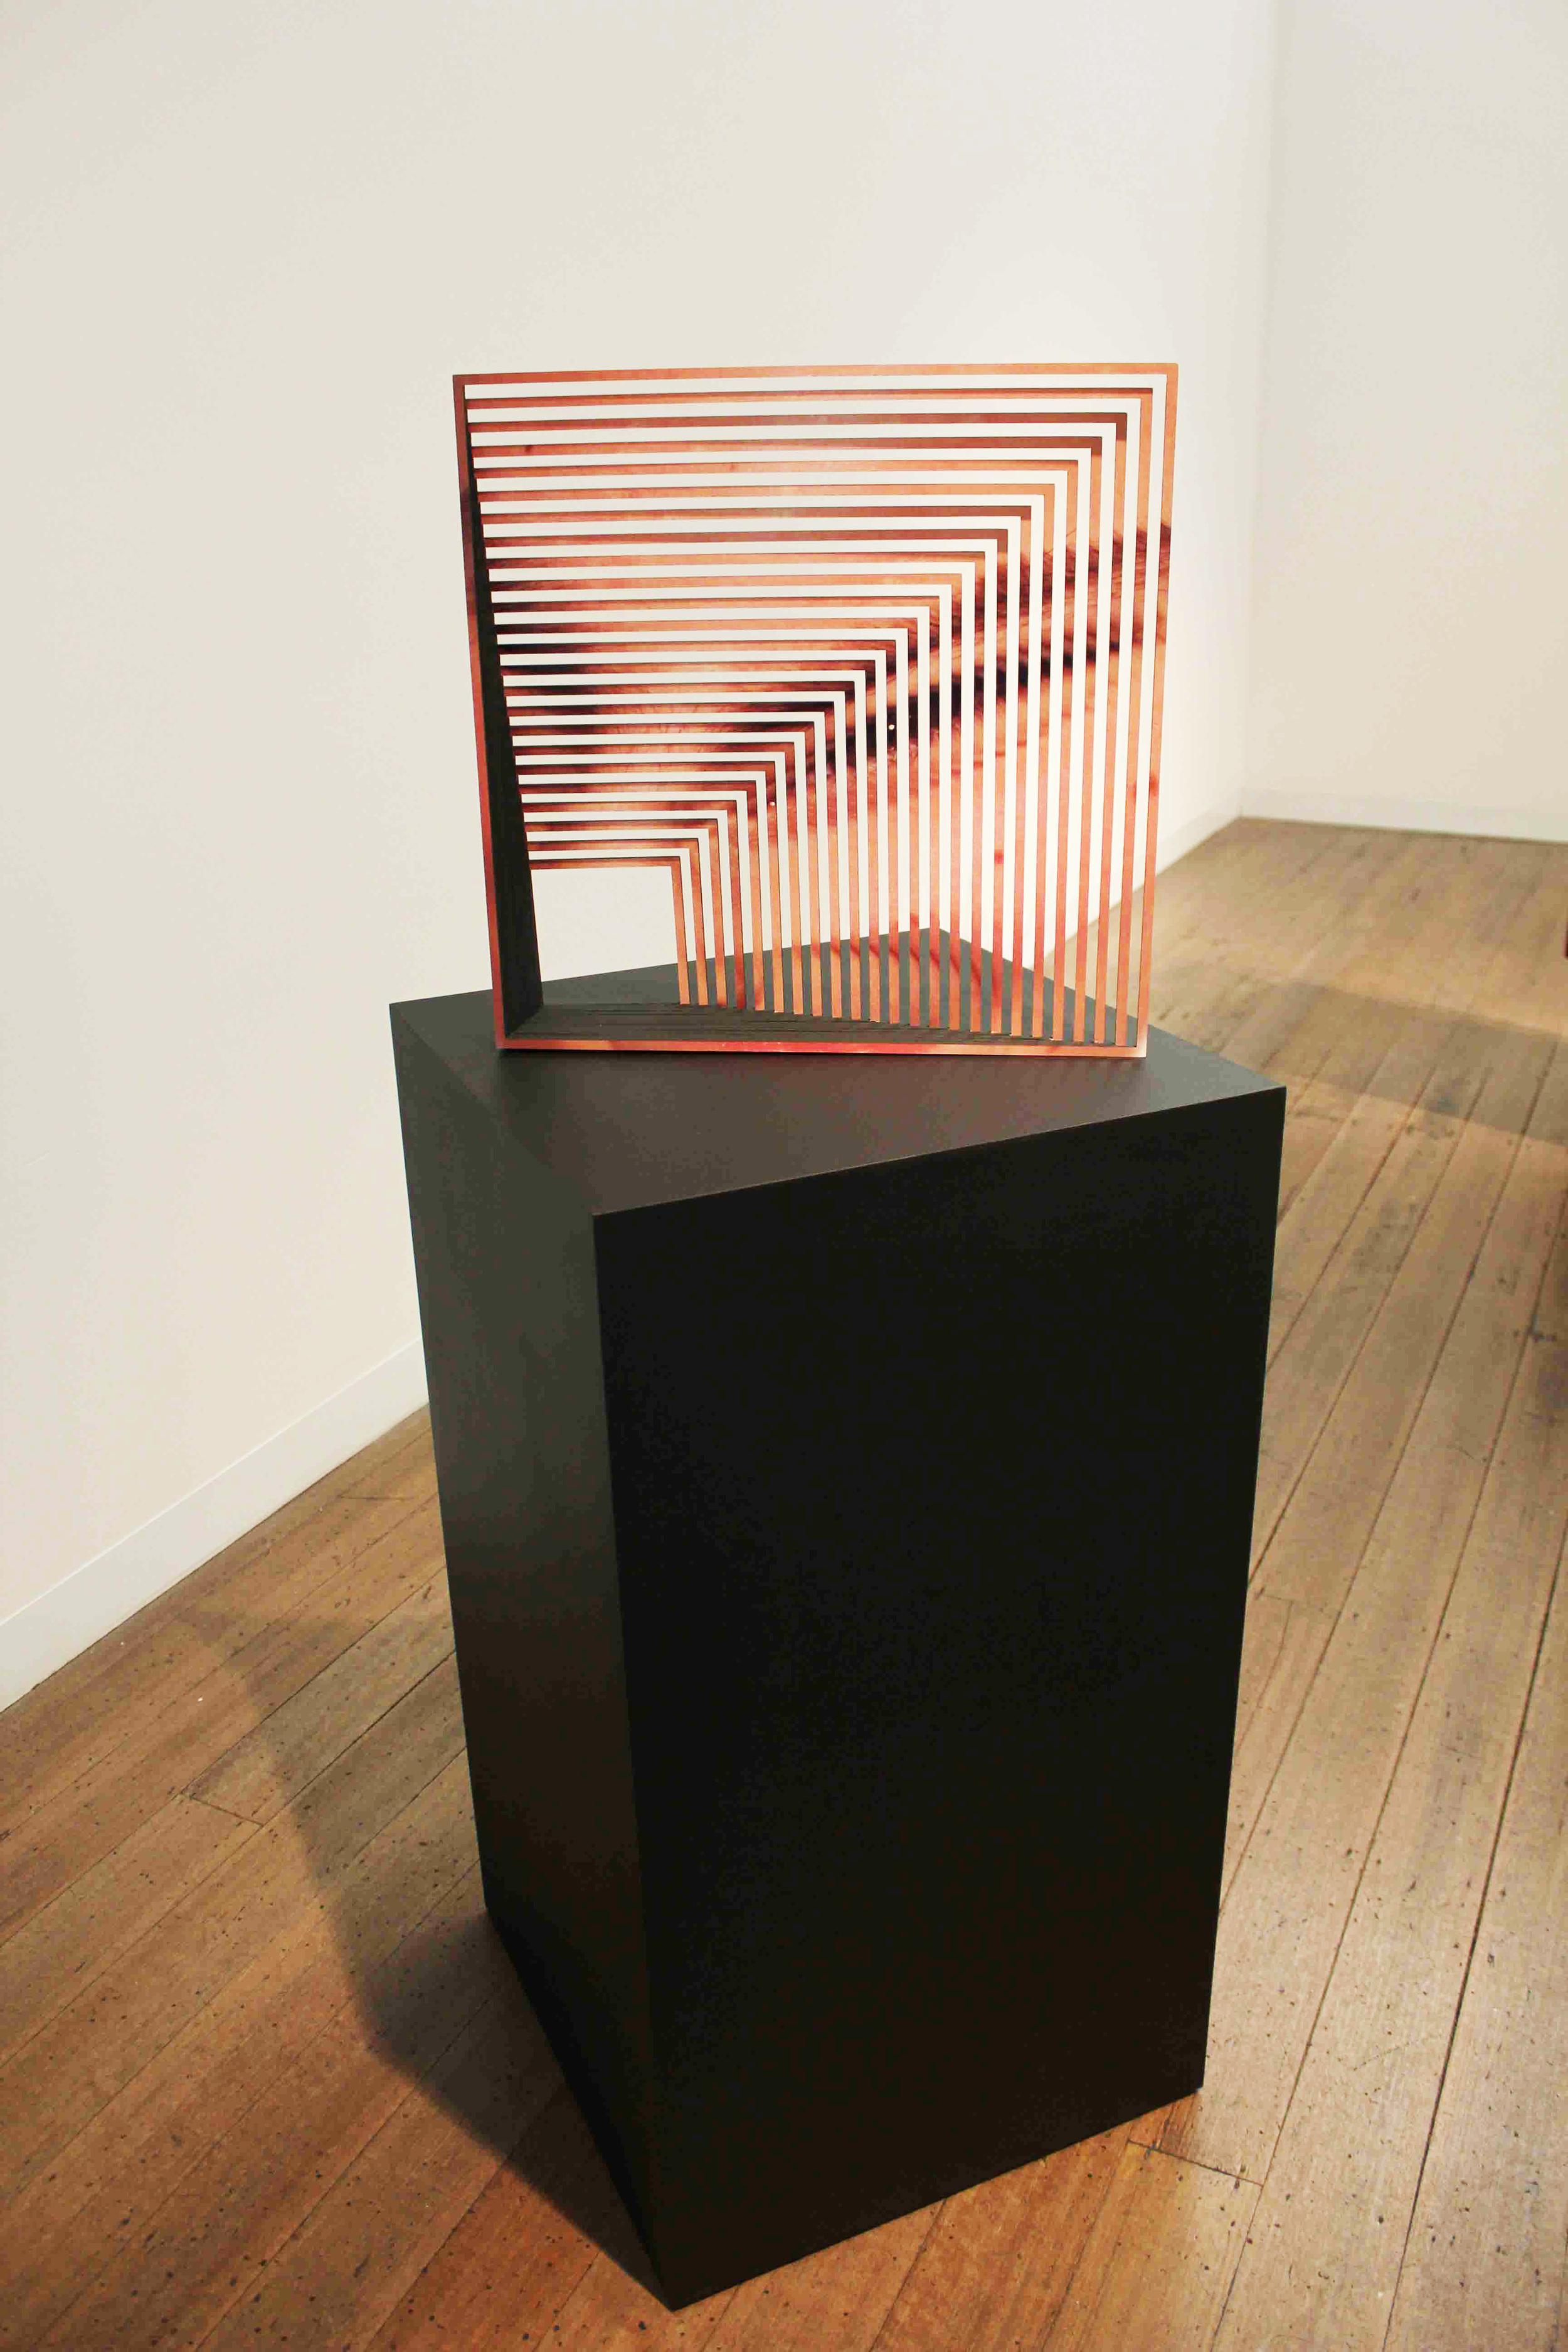 JUSTINE KHAMARA    Whether I am Asleep or Awake #4    2015   45 x 45 cm   Laser cut UV print on plywood, paint